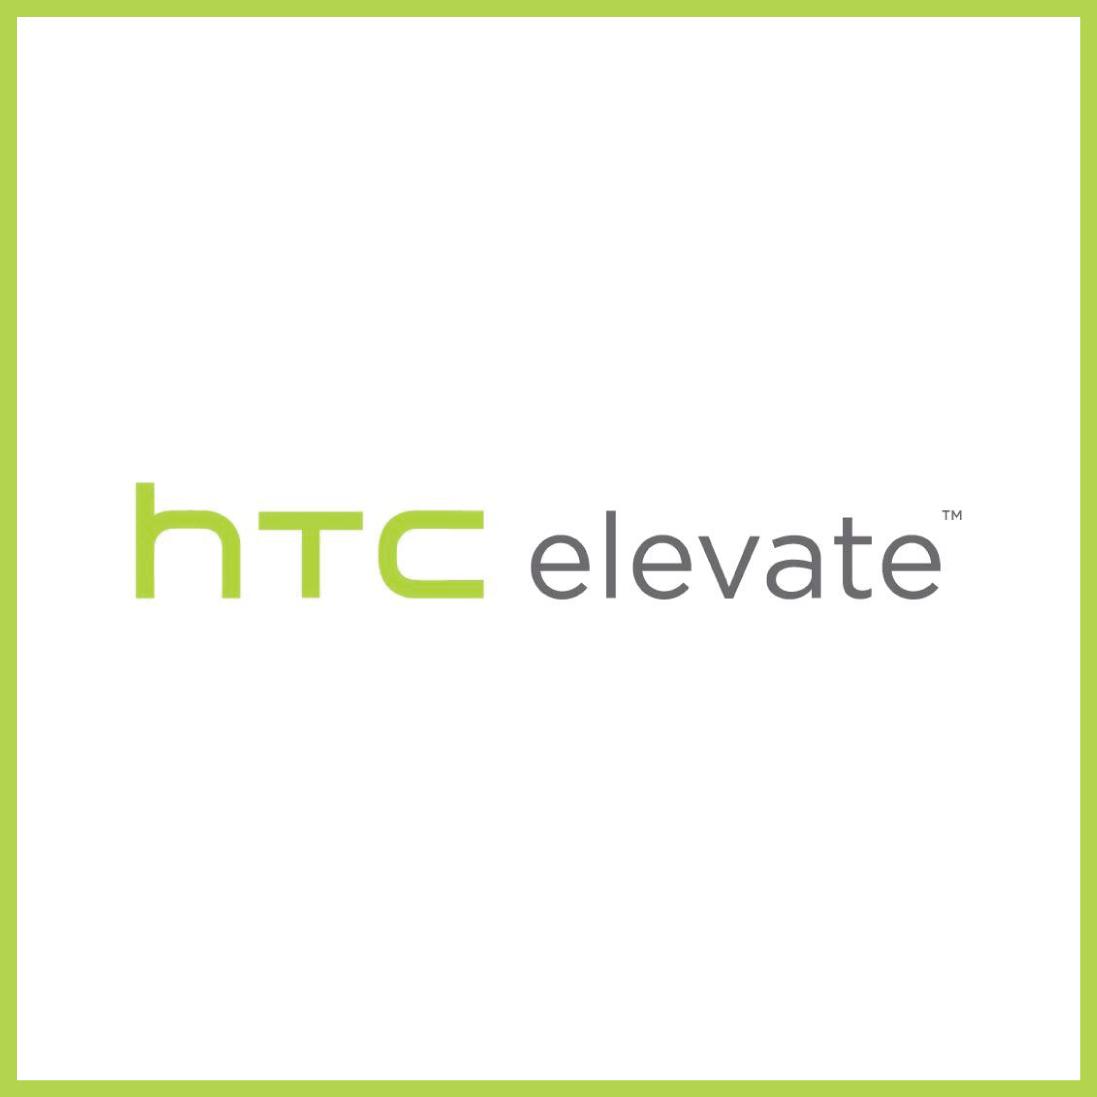 htc-elevate-card.png